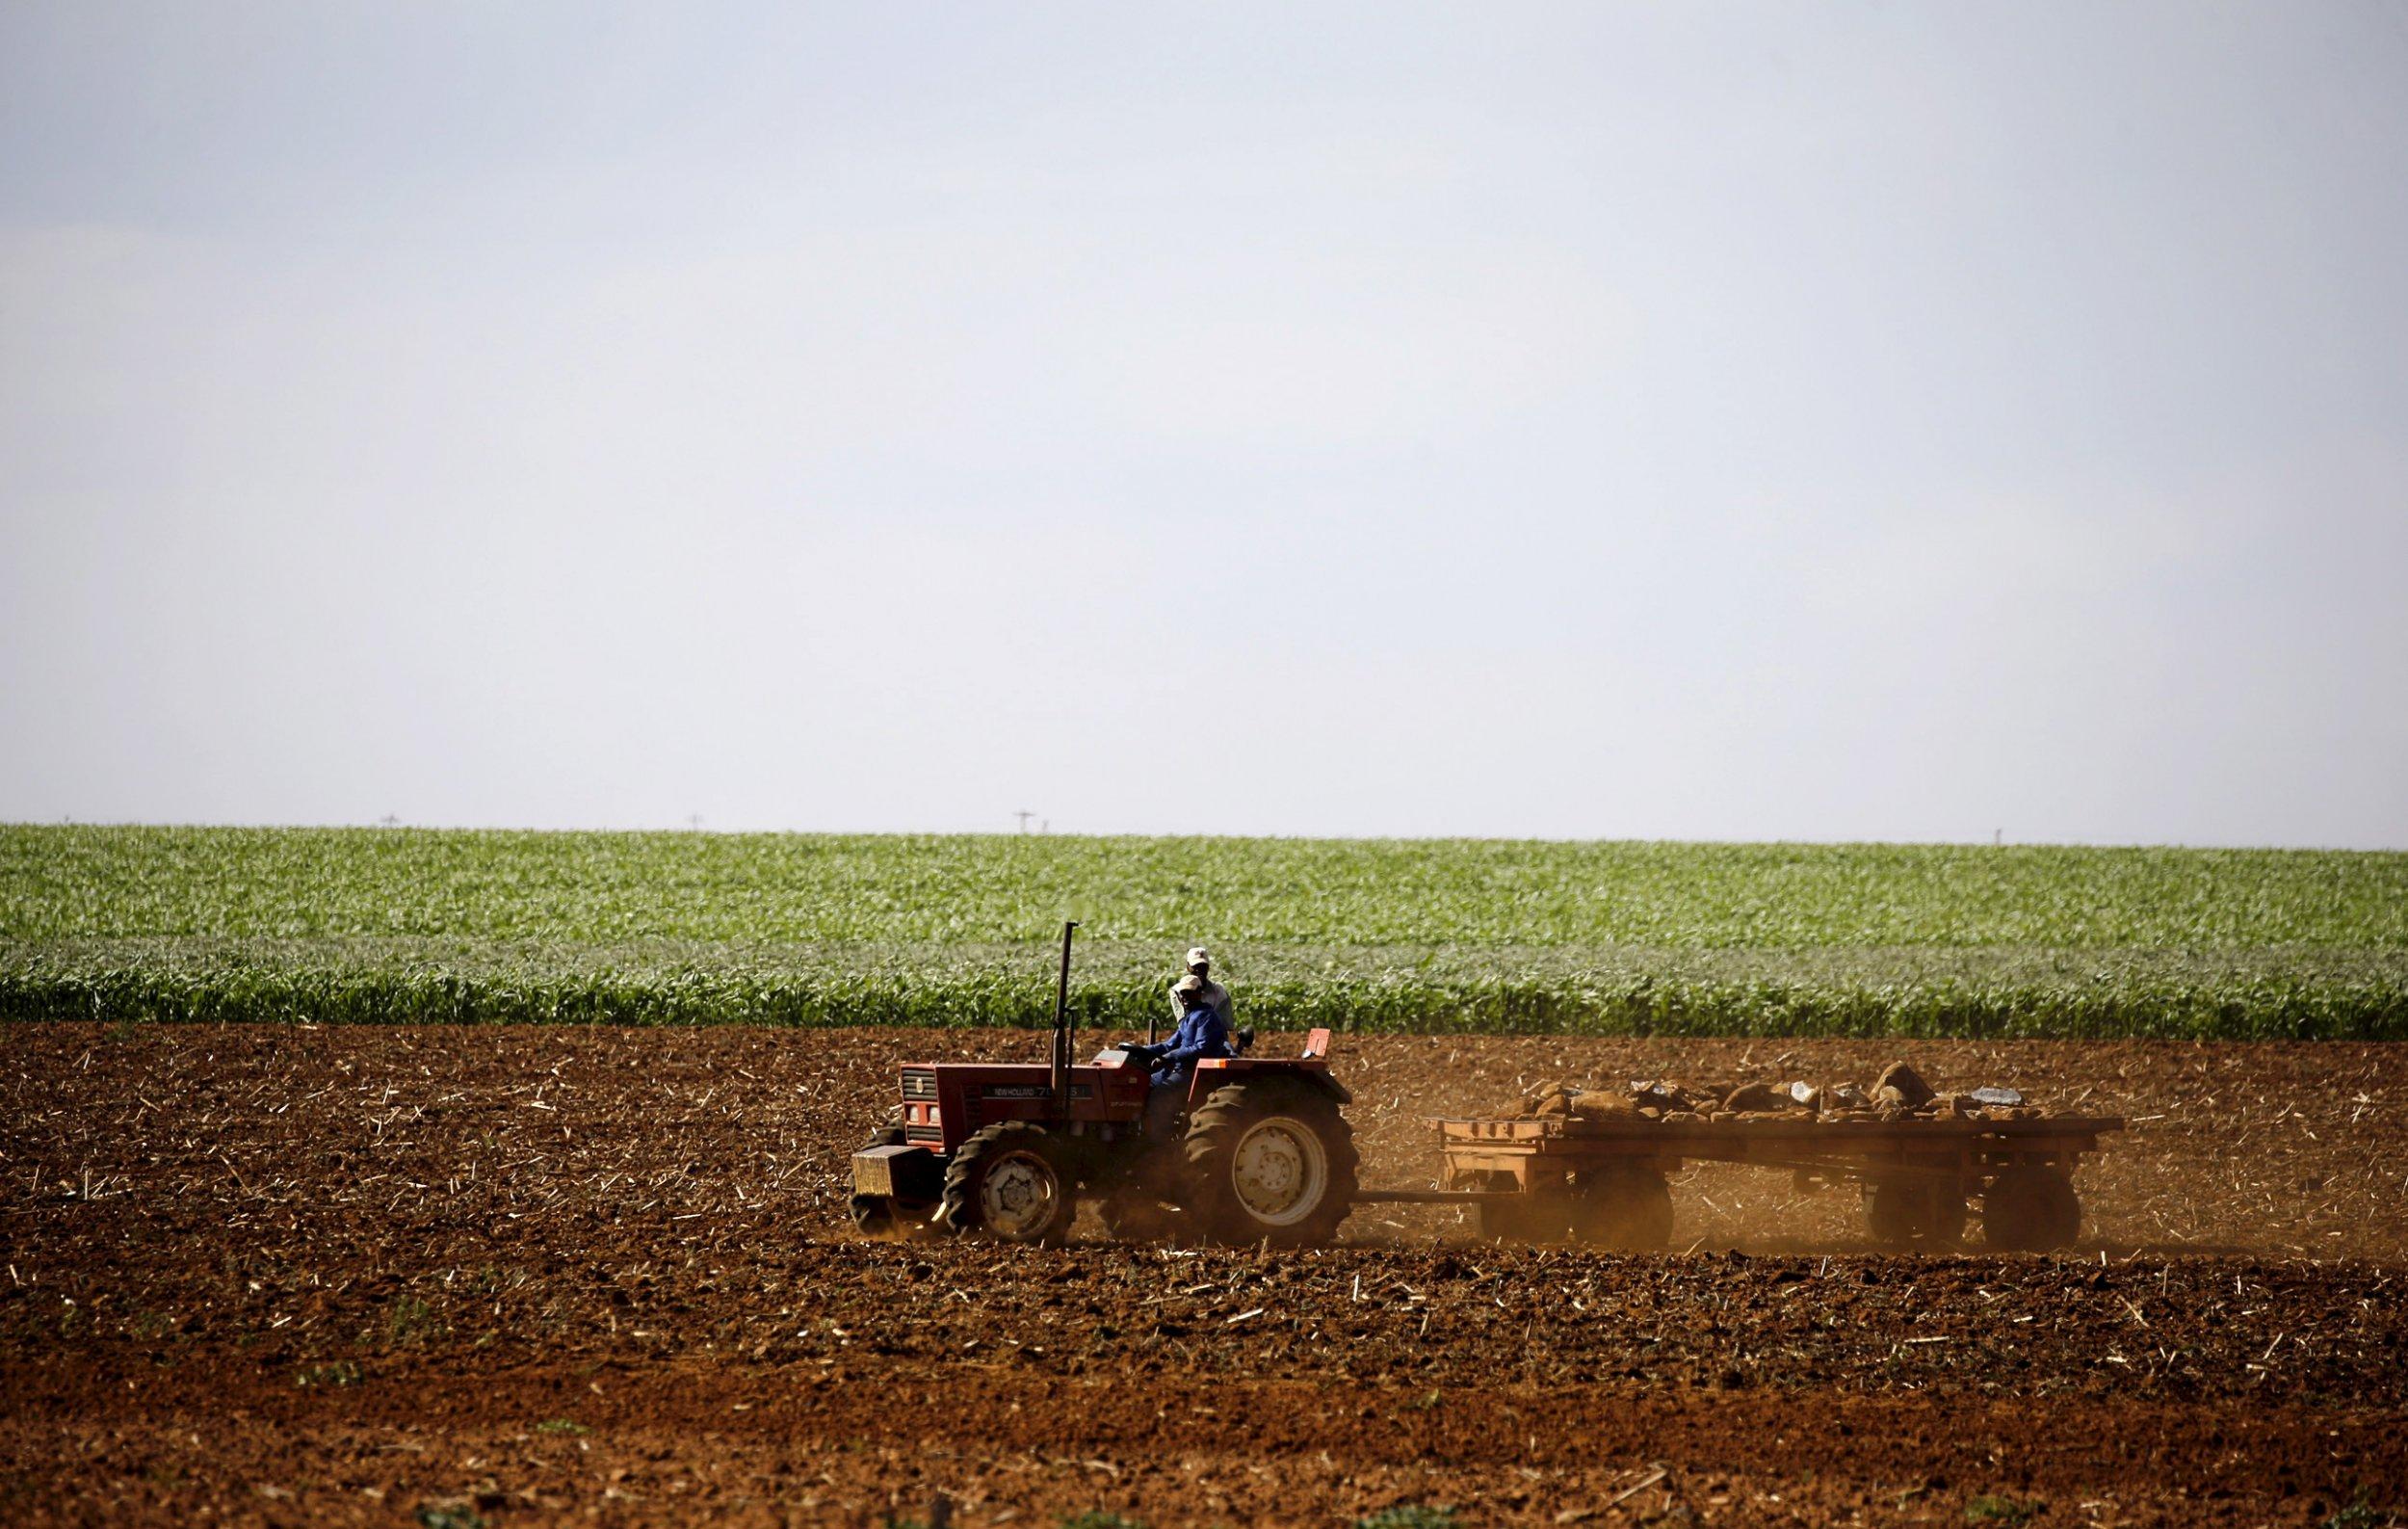 South African maize farmer